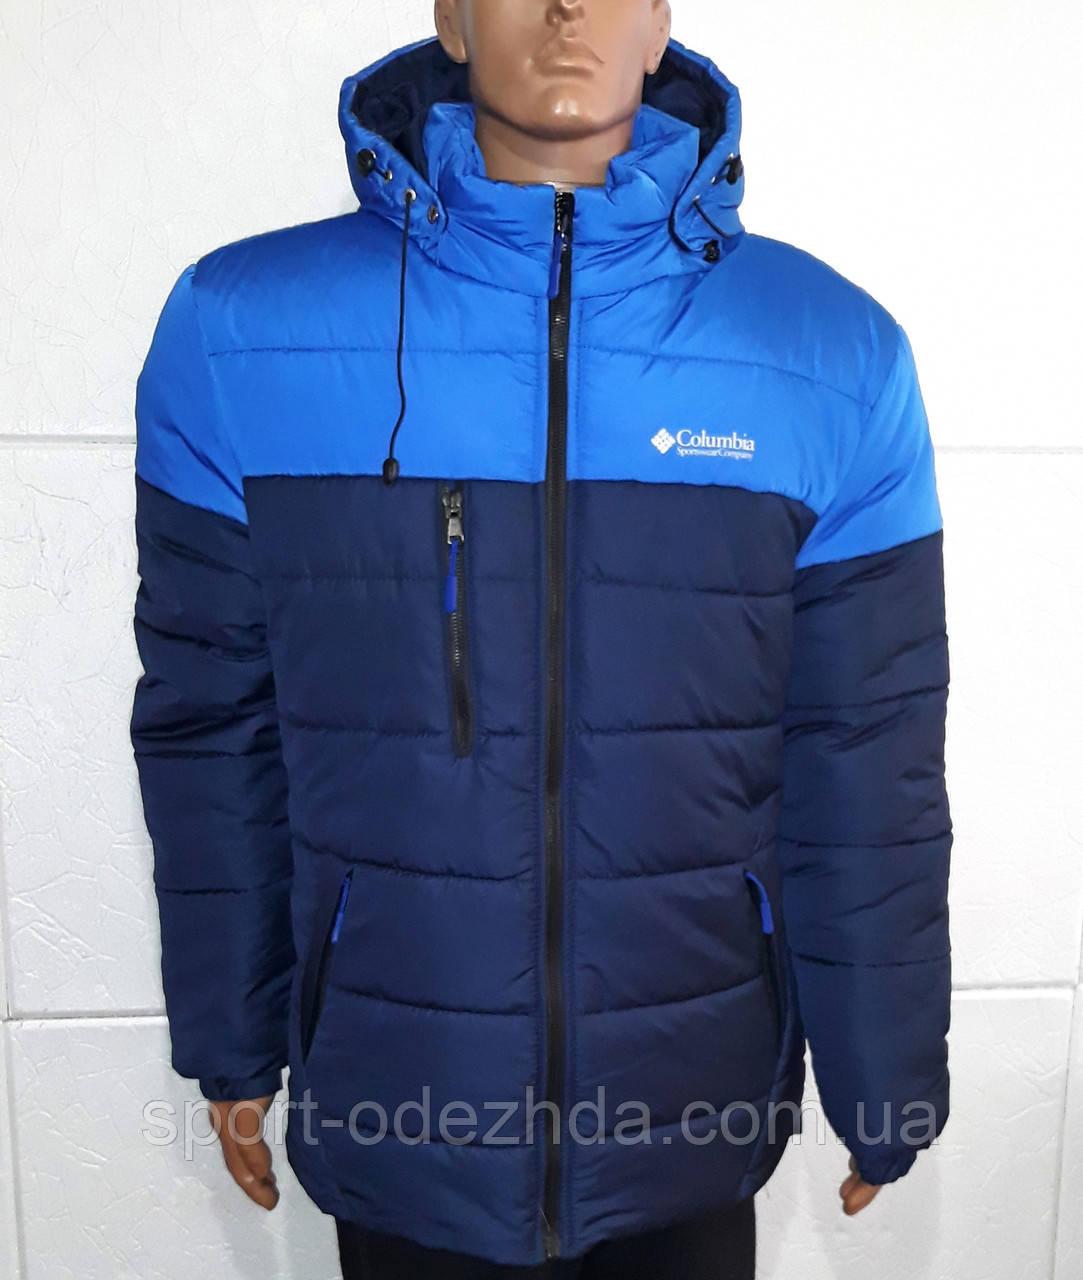 5c486fab зимние мужские куртки коламбия в категории куртки мужские на